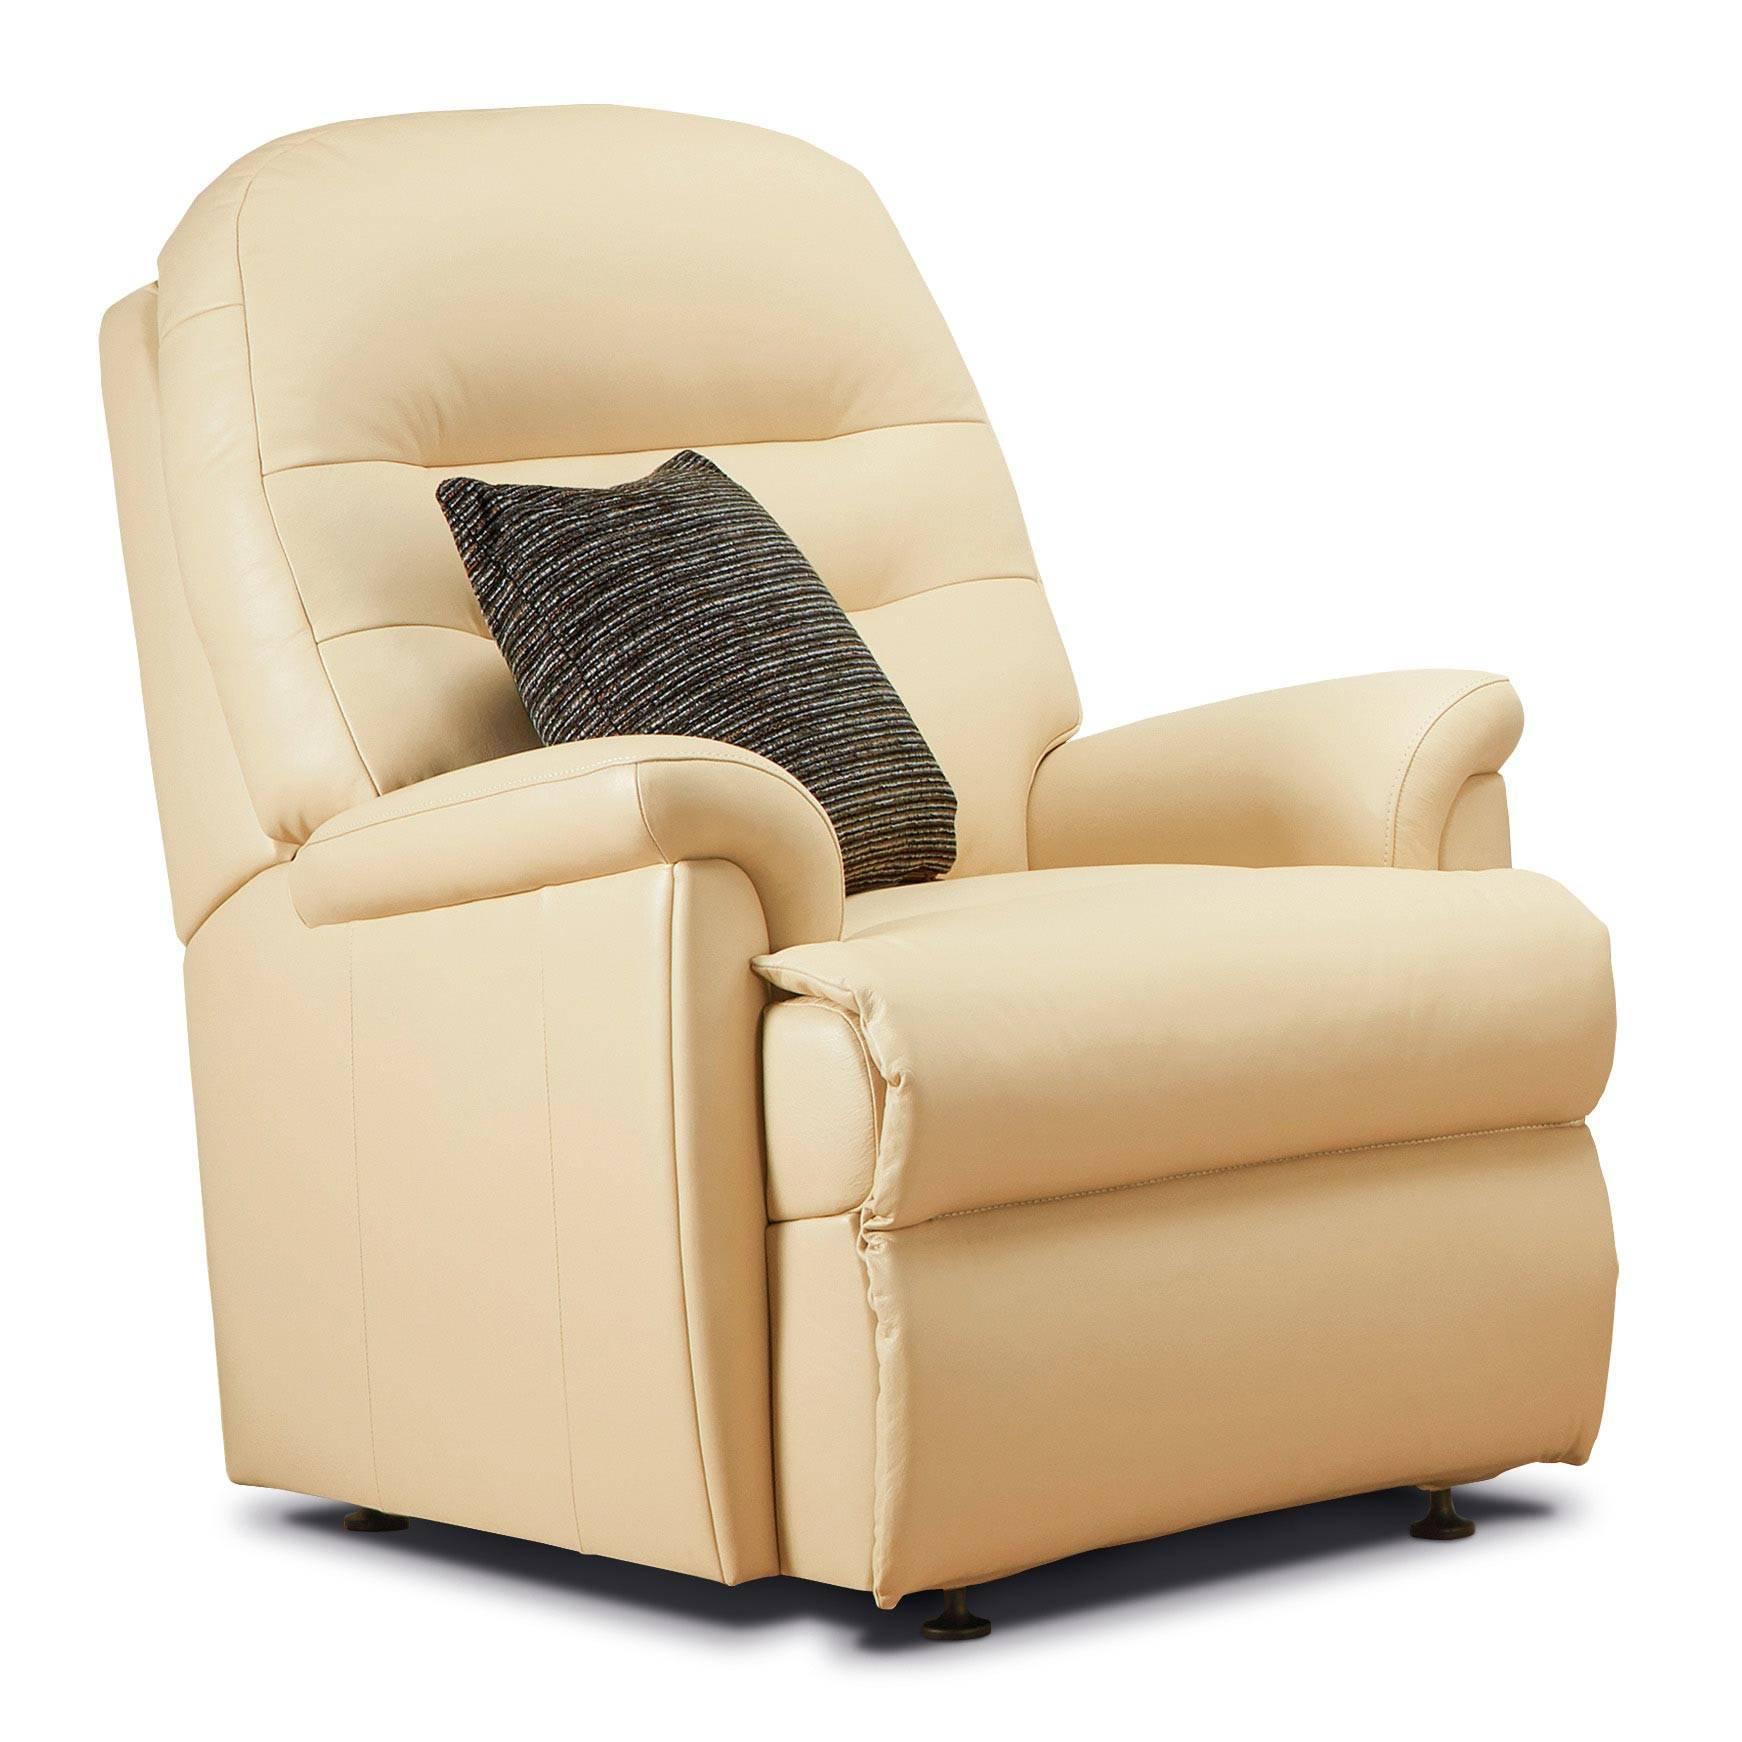 Ottomans Sherborne Ottoman Large: Sherborne Keswick Chair